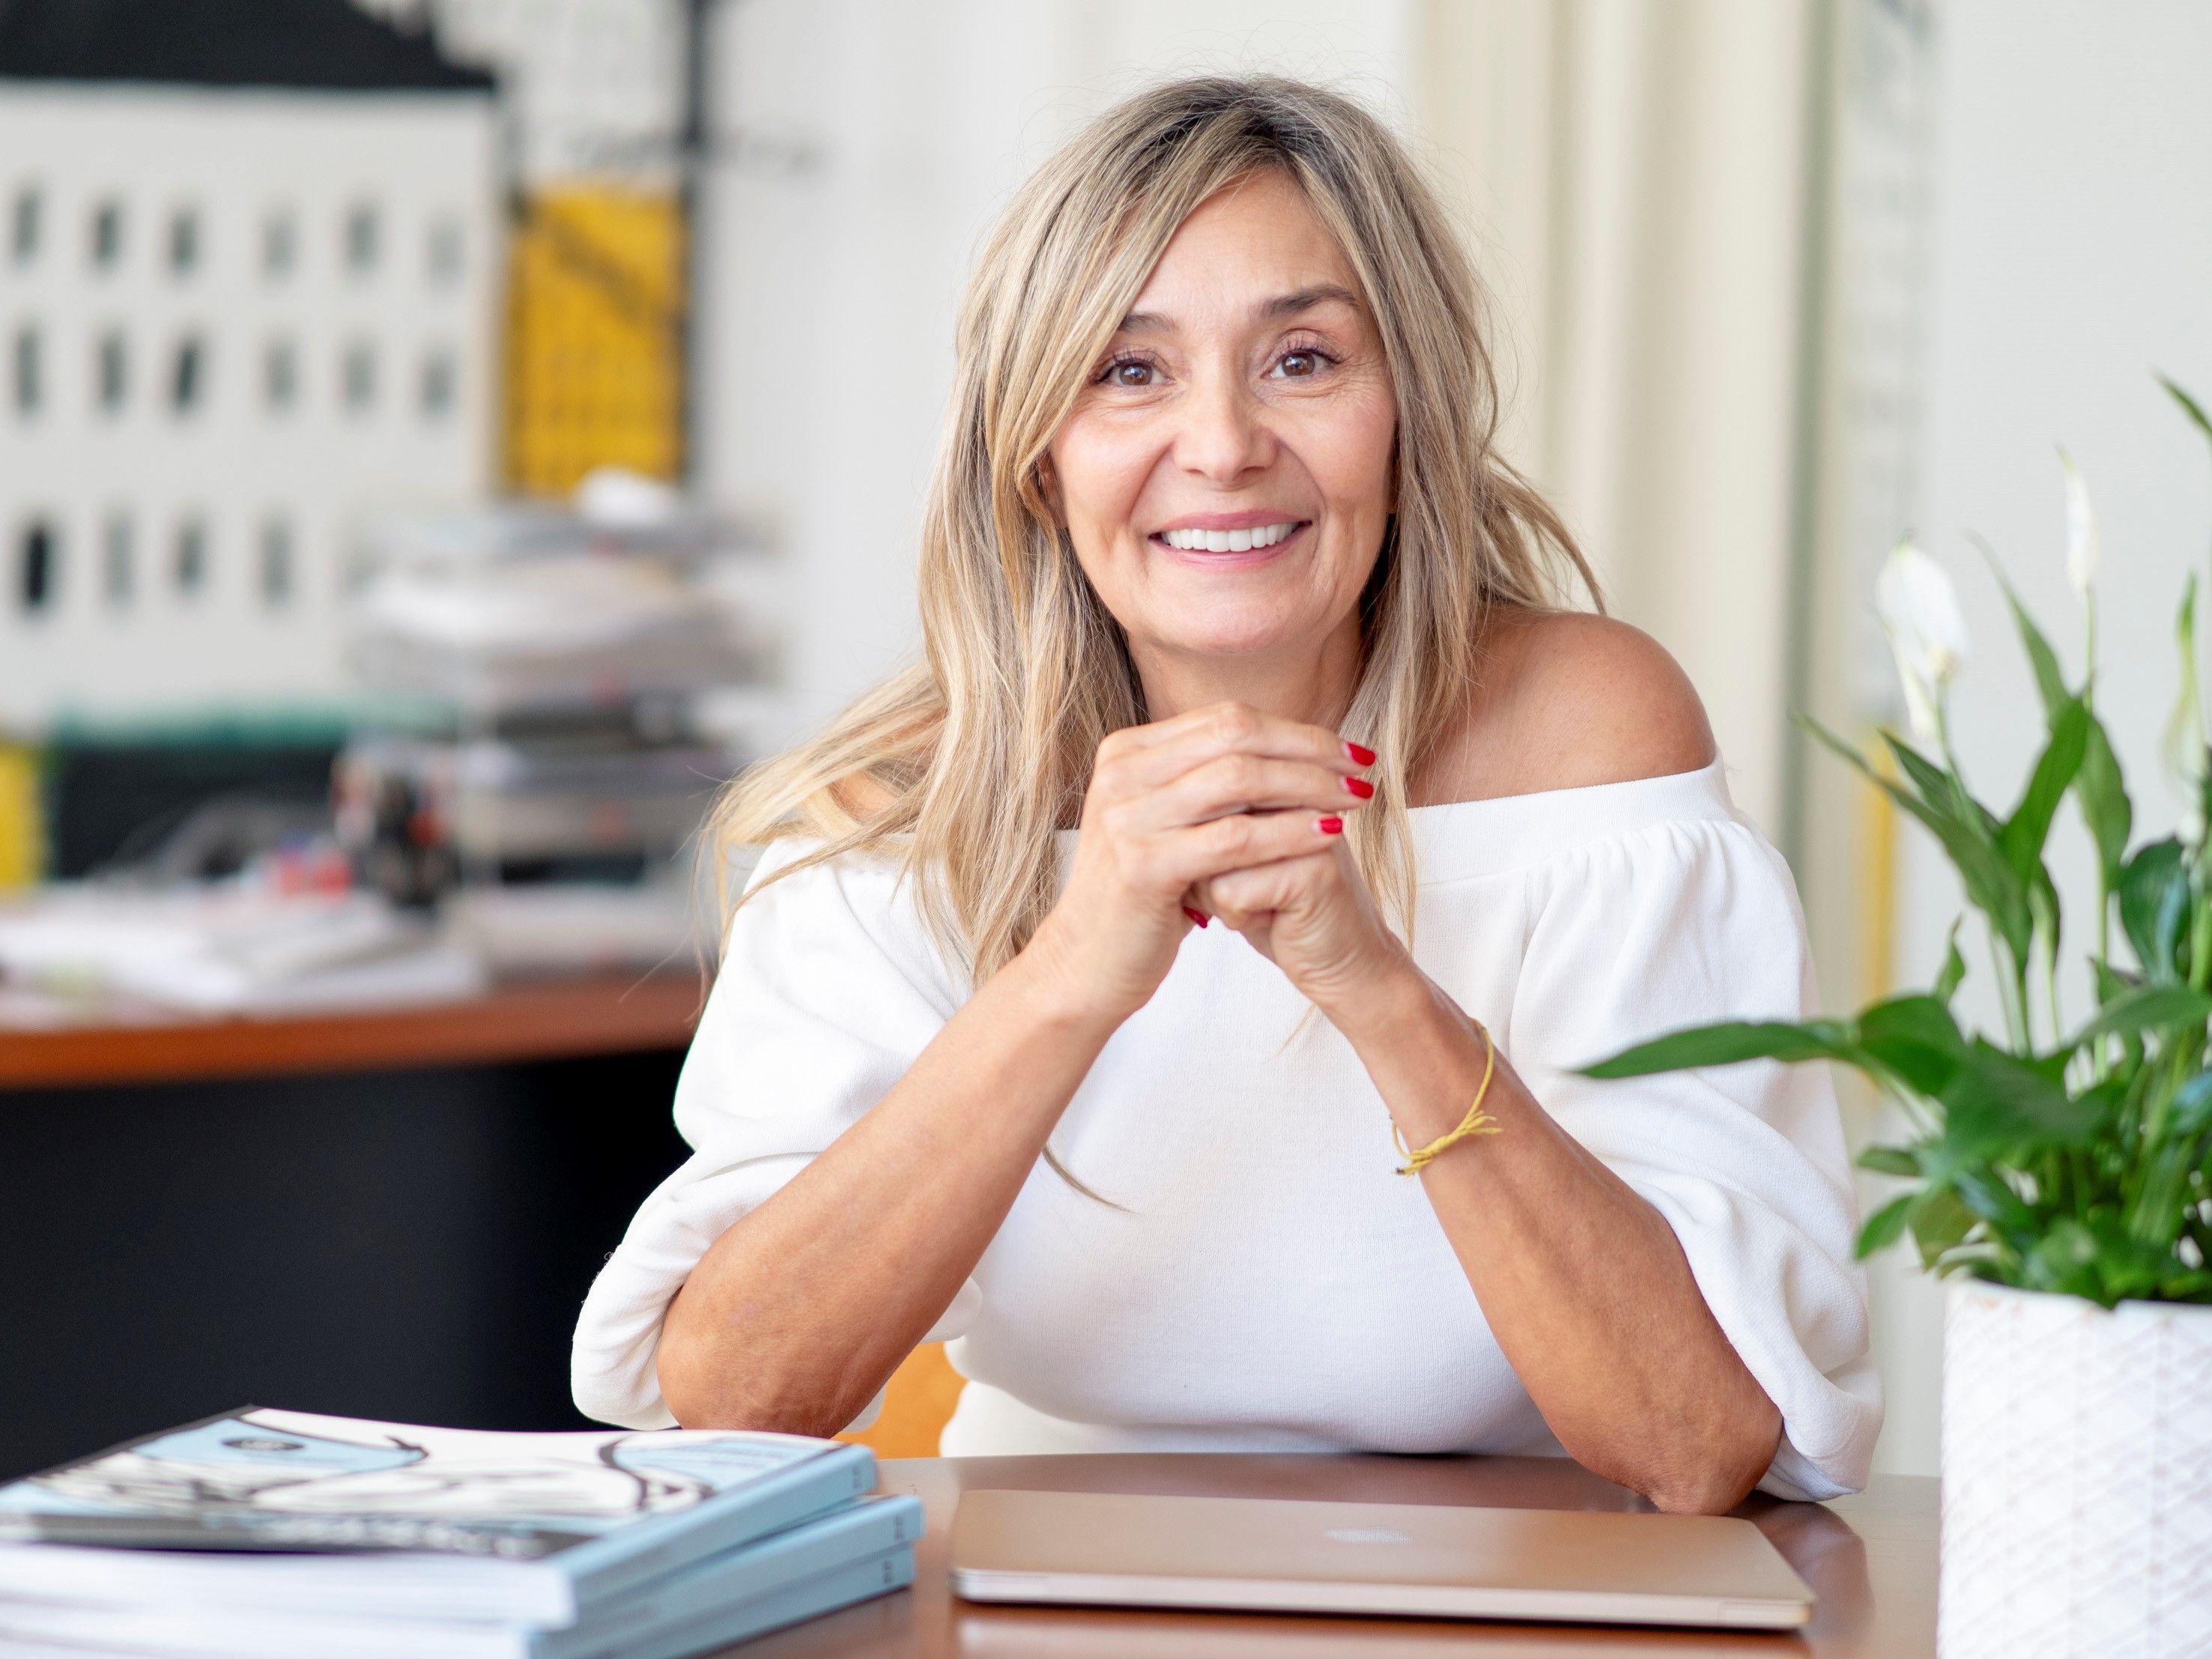 Julia Higueras